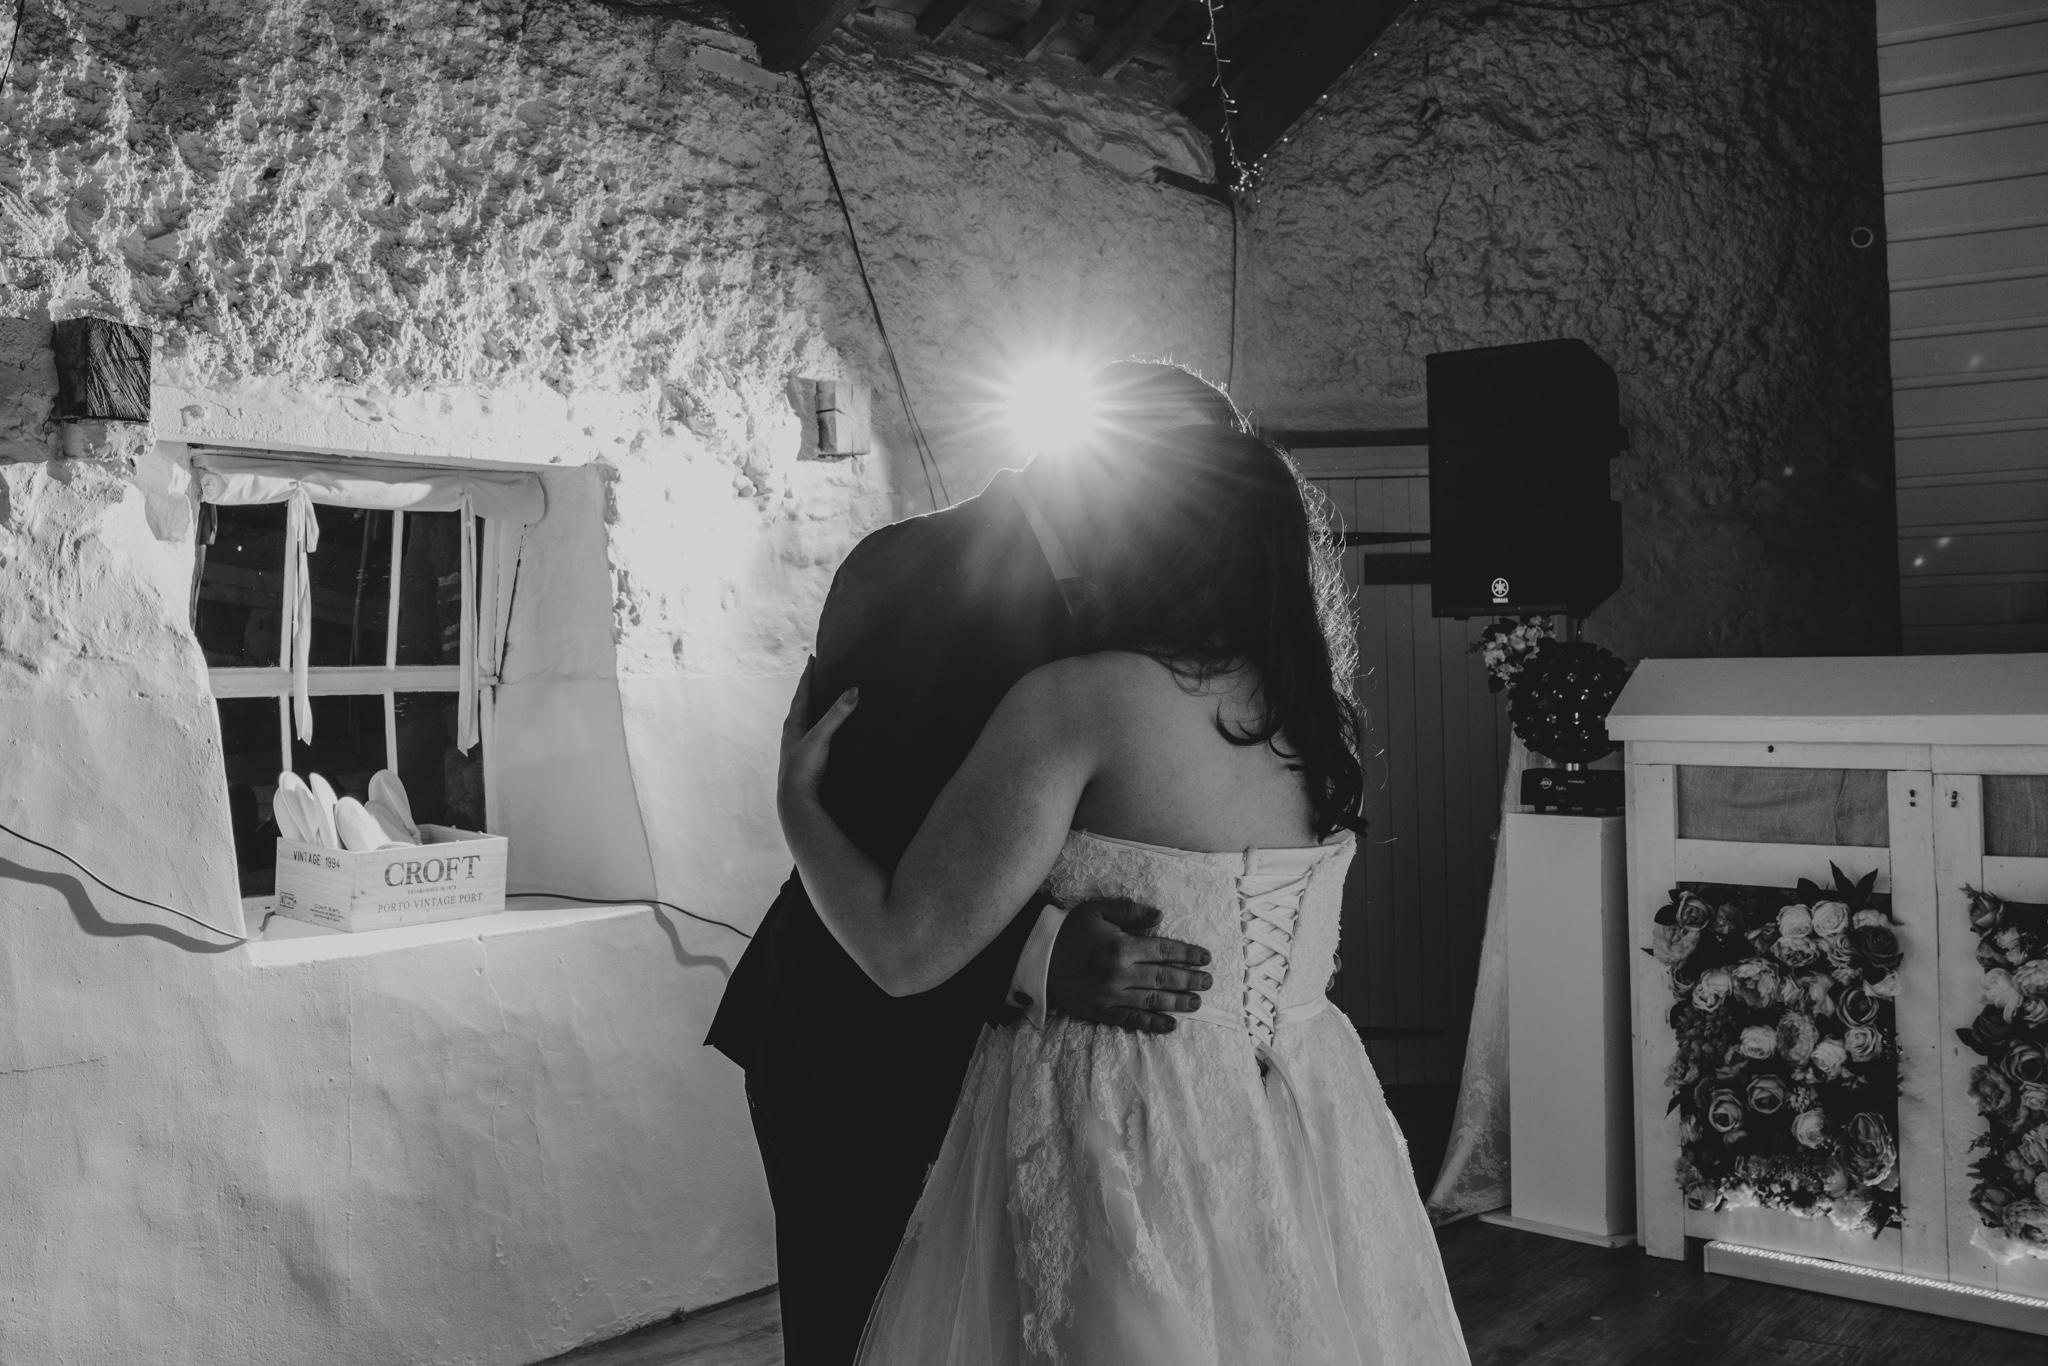 grace-sam-old-barn-clovelly-devon-wedding-photographer-grace-elizabeth-essex-suffolk-norfolk-wedding-photographer (116 of 132).jpg